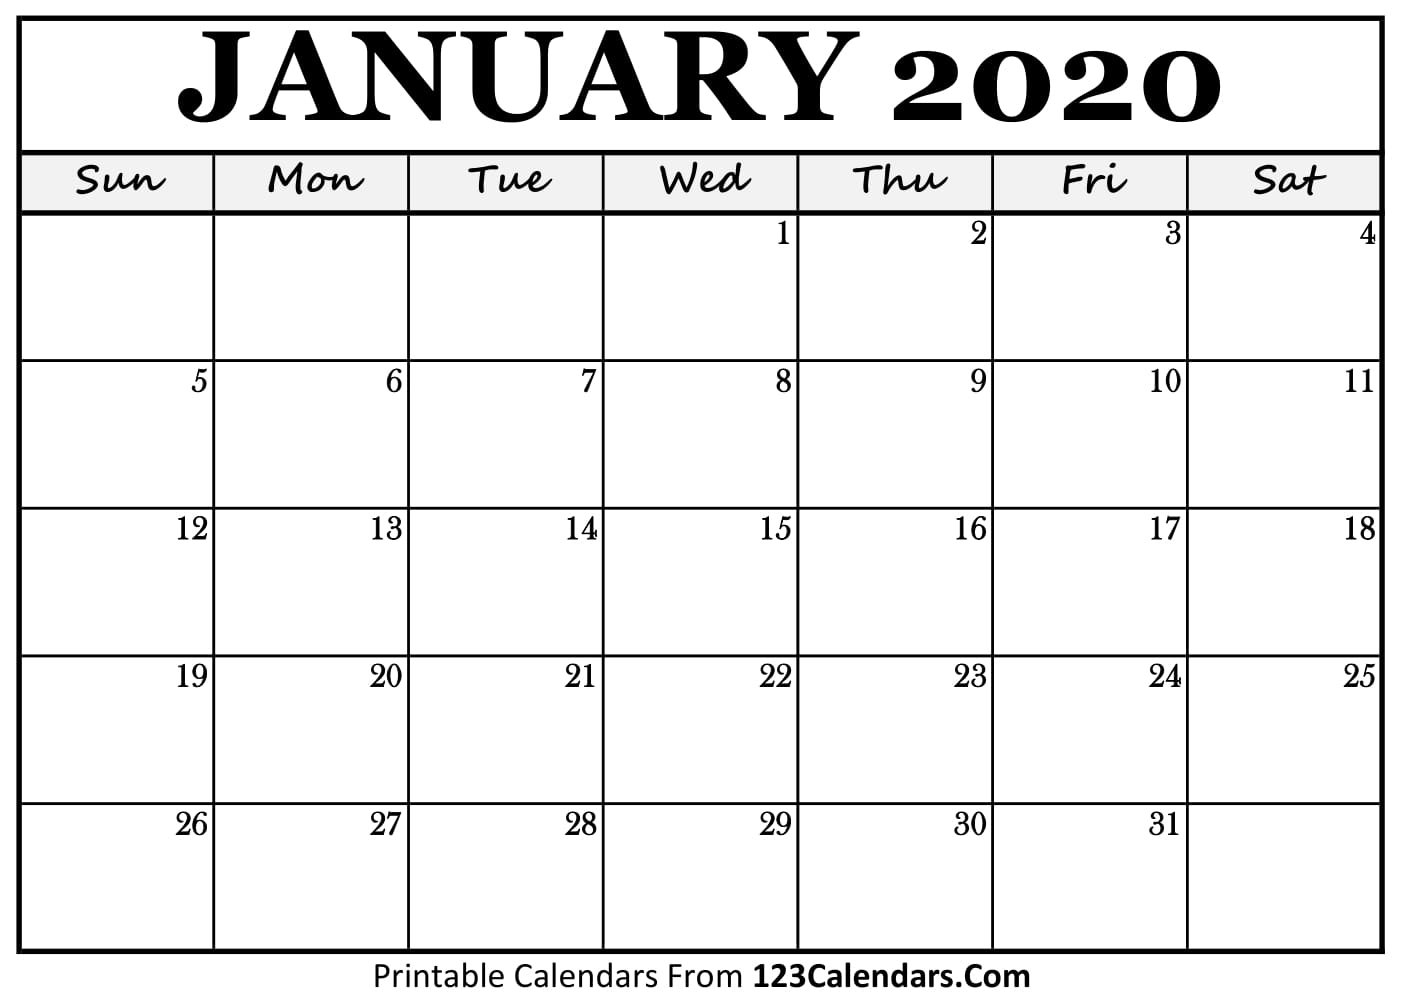 January 2020 Printable Calendar | 123Calendars Blank Calendars To Fill In Online